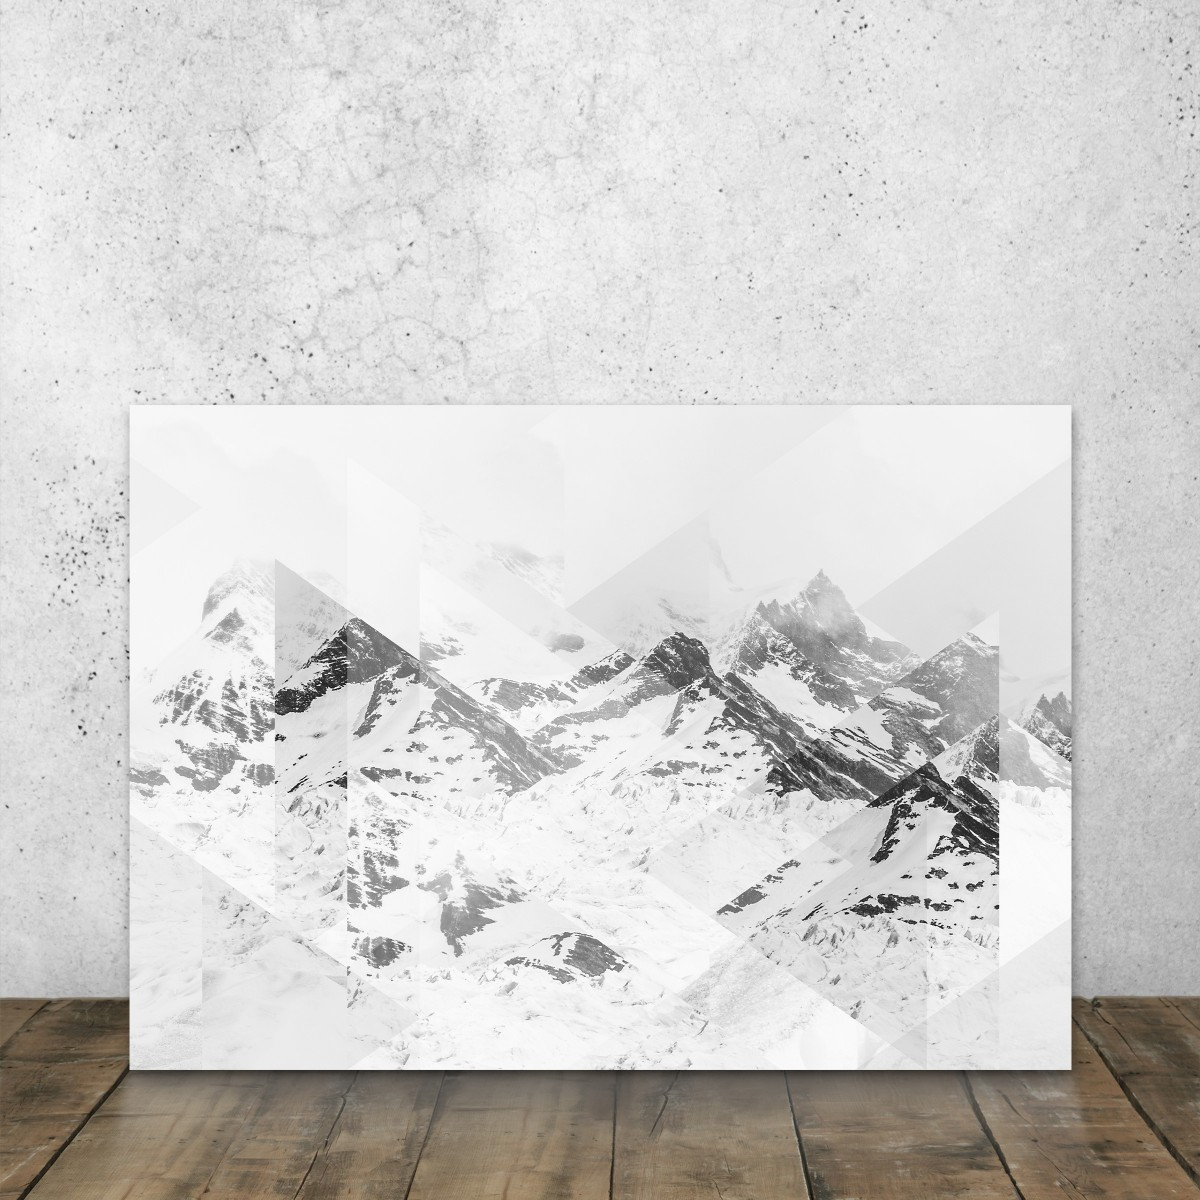 JOE MANIA / Modern Artprint Poster / Scattered Landscapes (Perito Moreno B&W) DIN A4 - A0